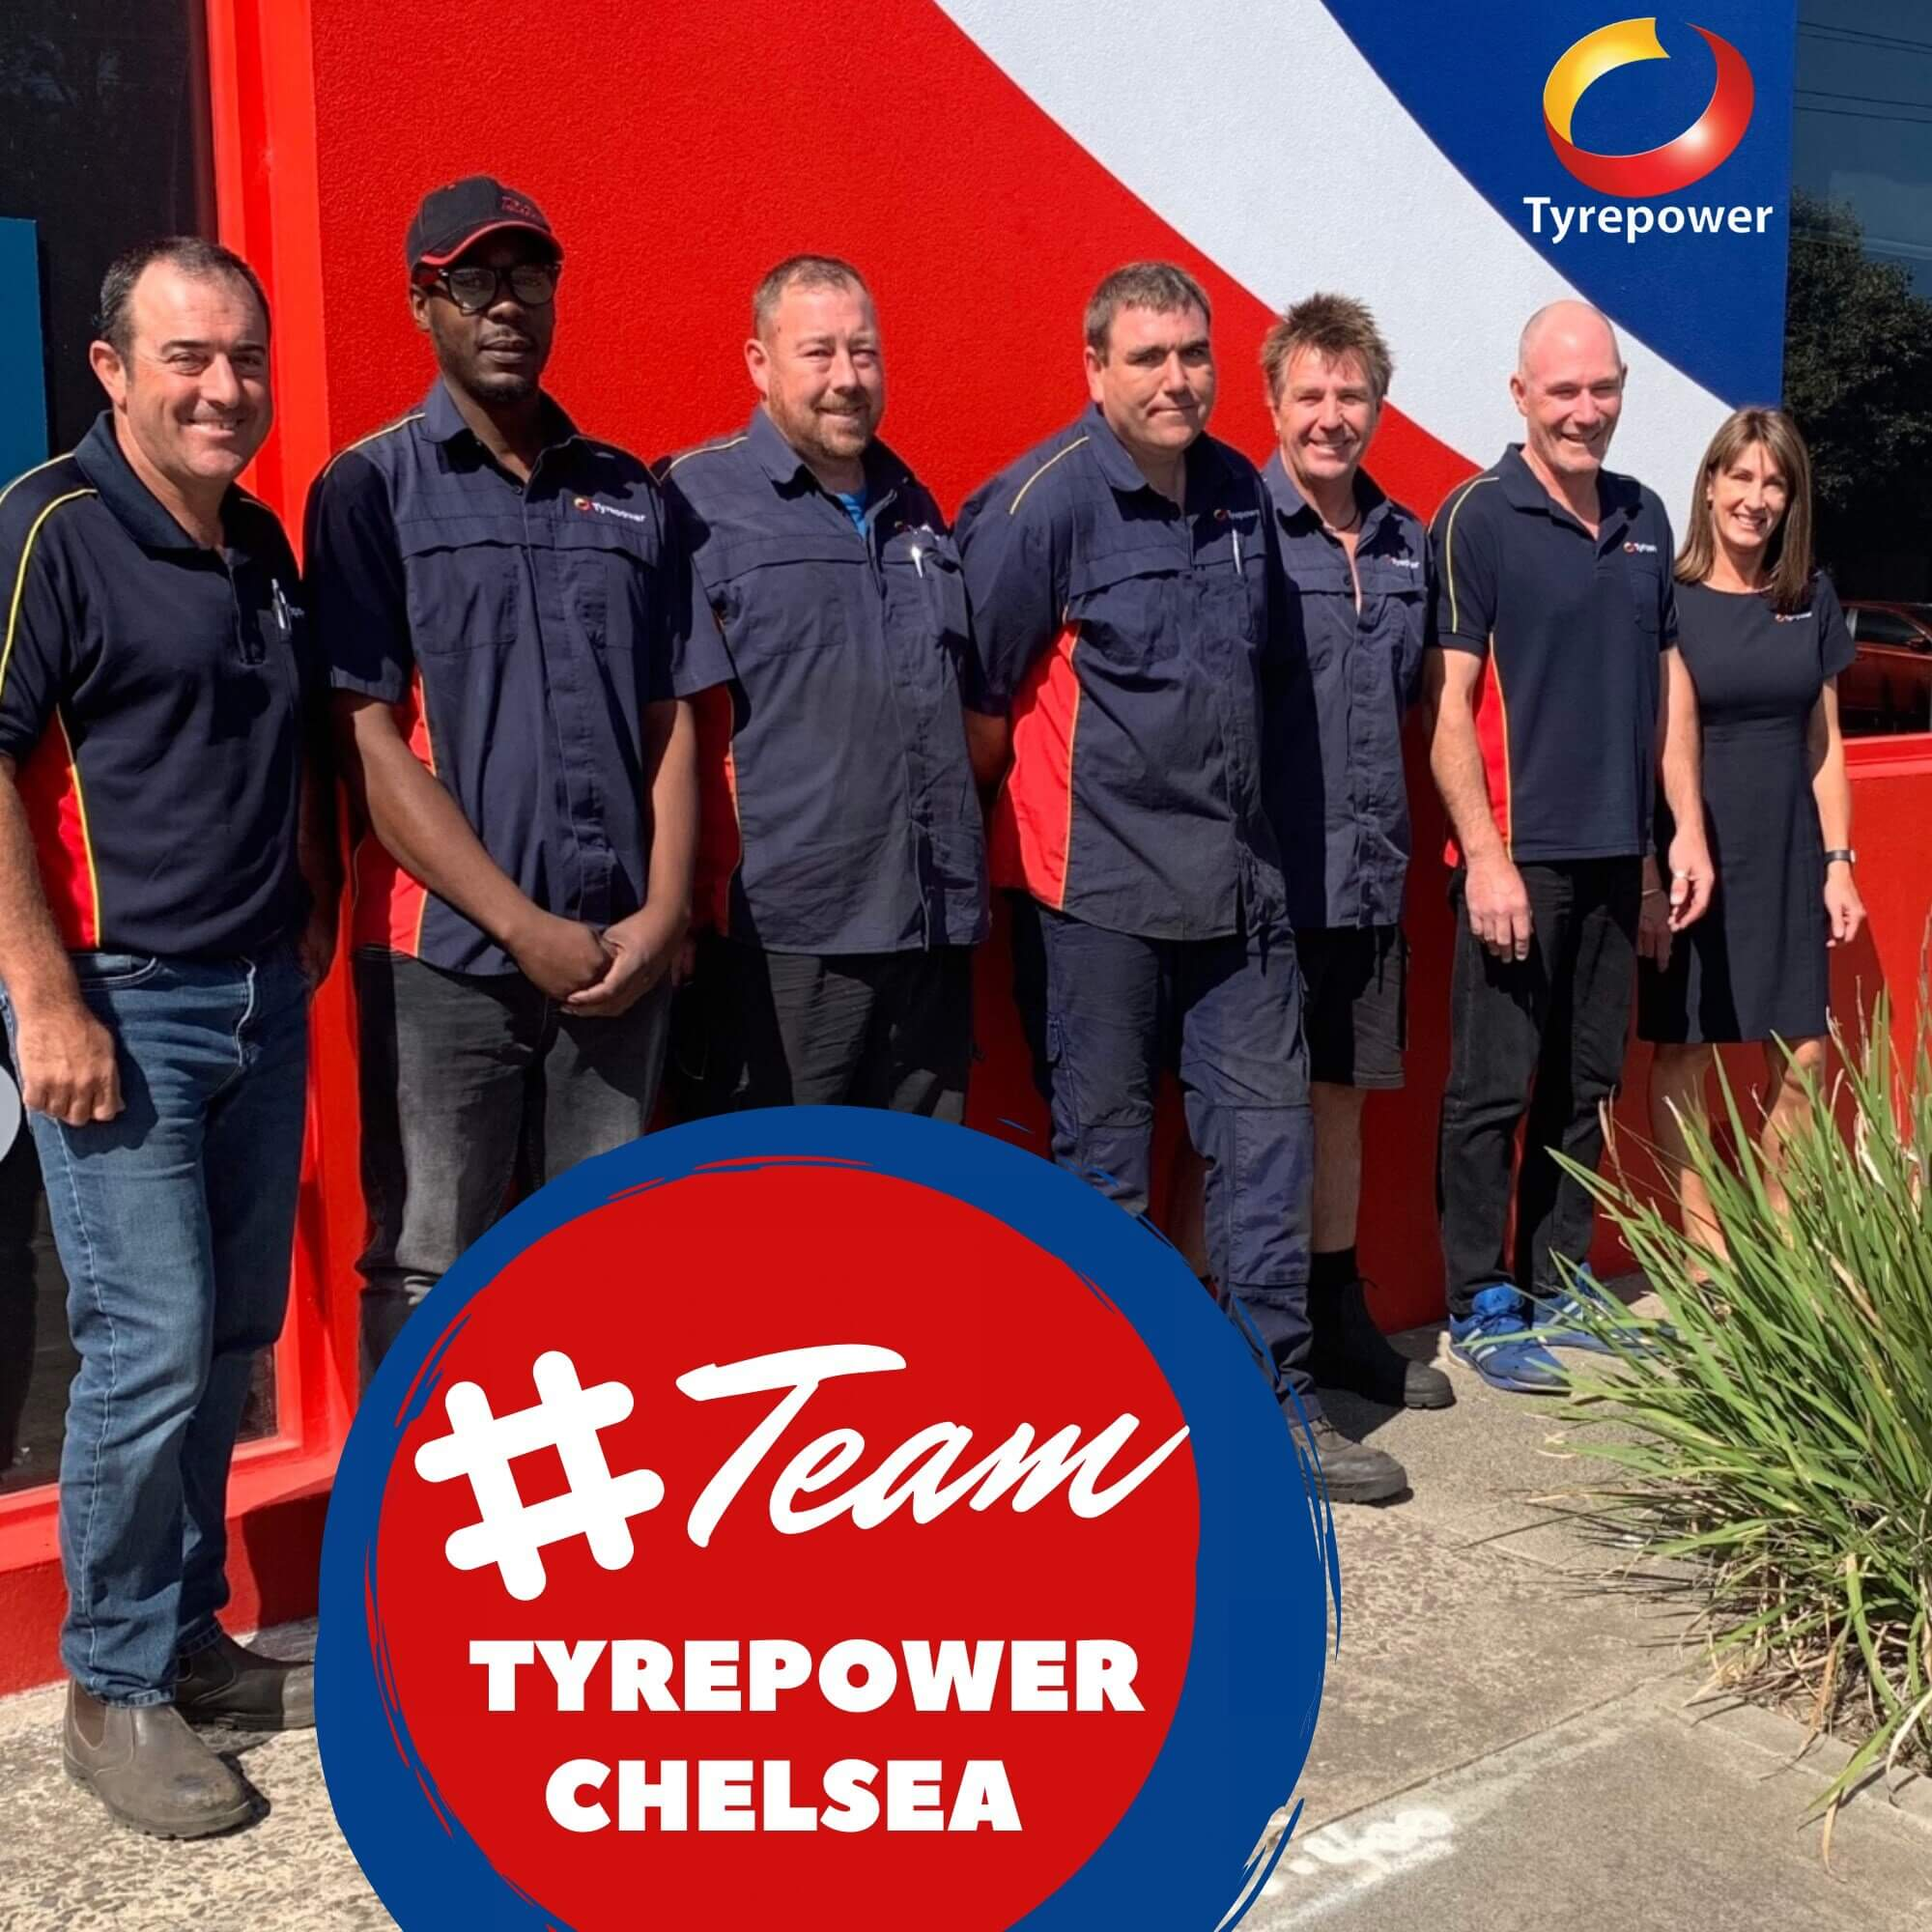 Tyrepower Chelsea